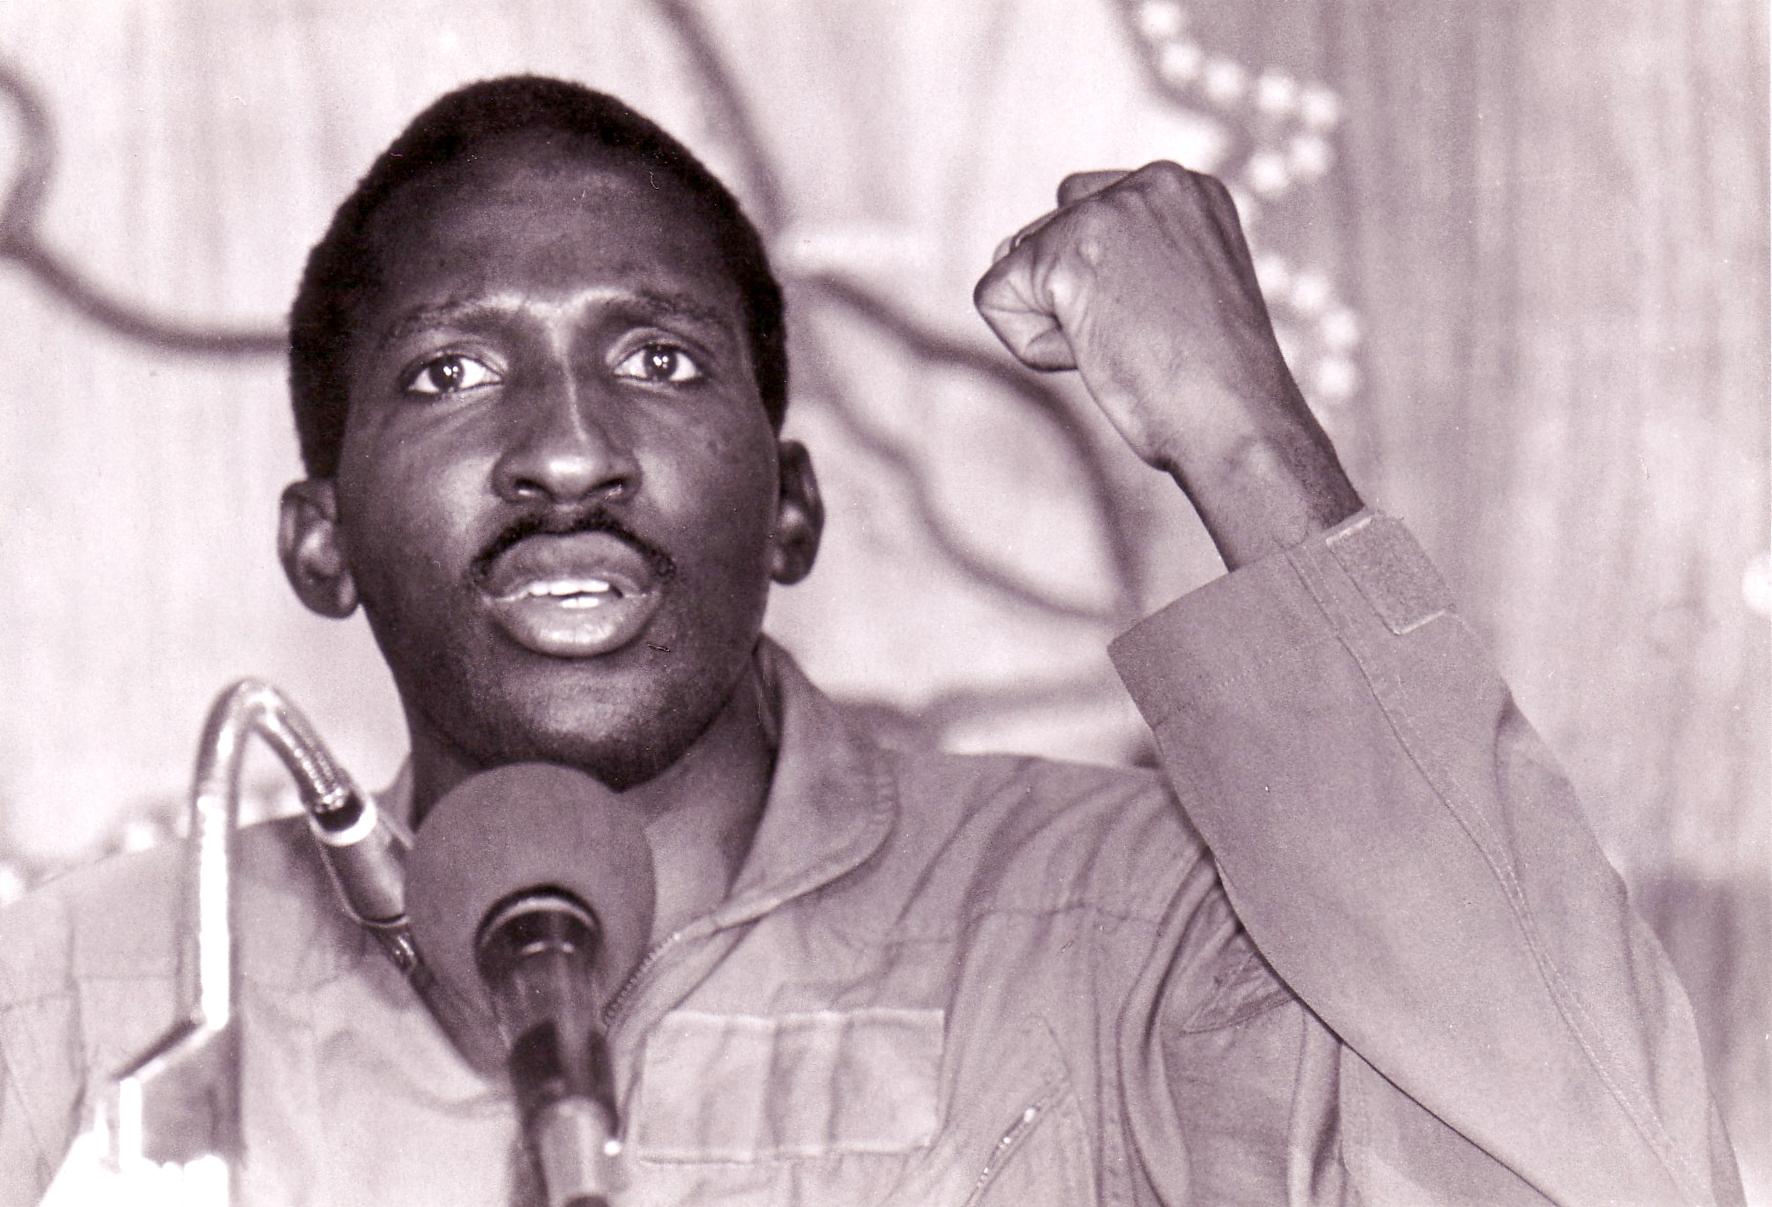 Remembering Thomas Sankara, the African Che